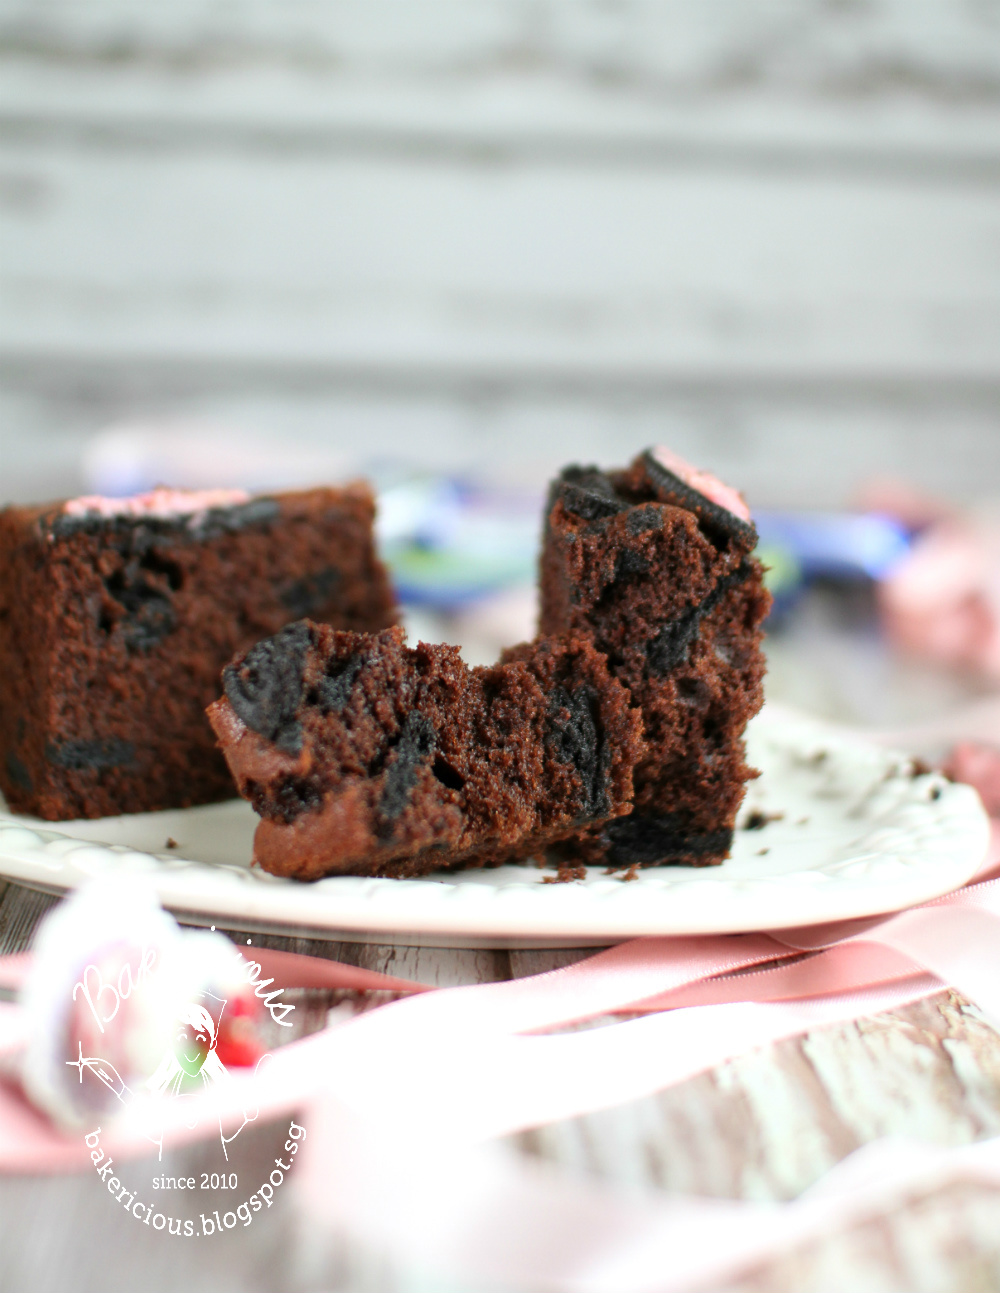 Bakericious: Whole Wheat Mocha Cake 摩卡全麦蛋糕 LTU #10